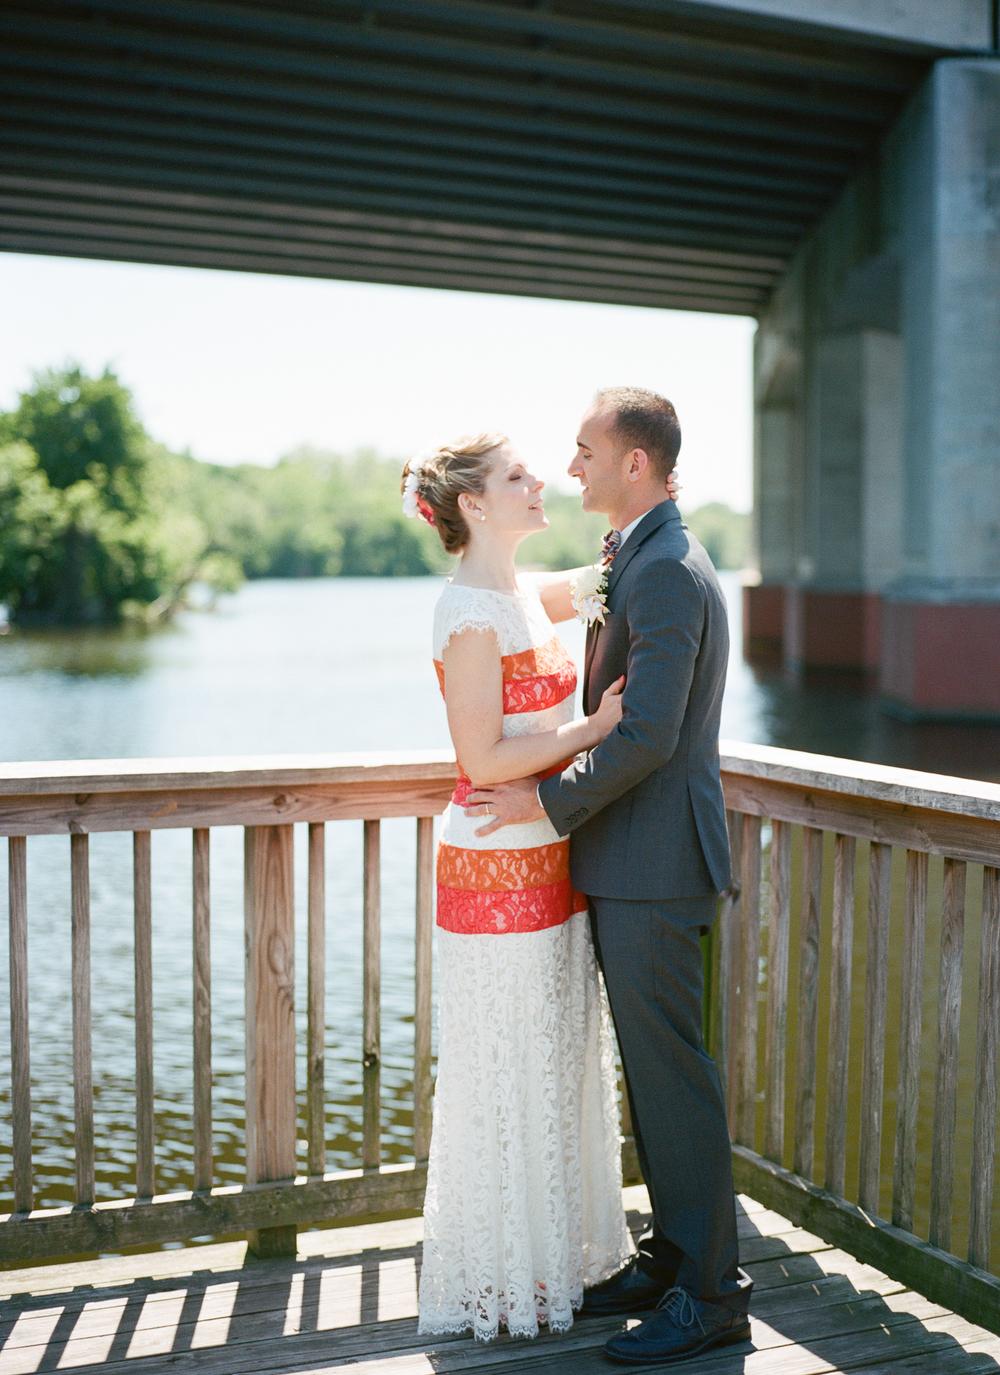 MarkHeather-Occoquan-Virginia-Wedding-61.jpg